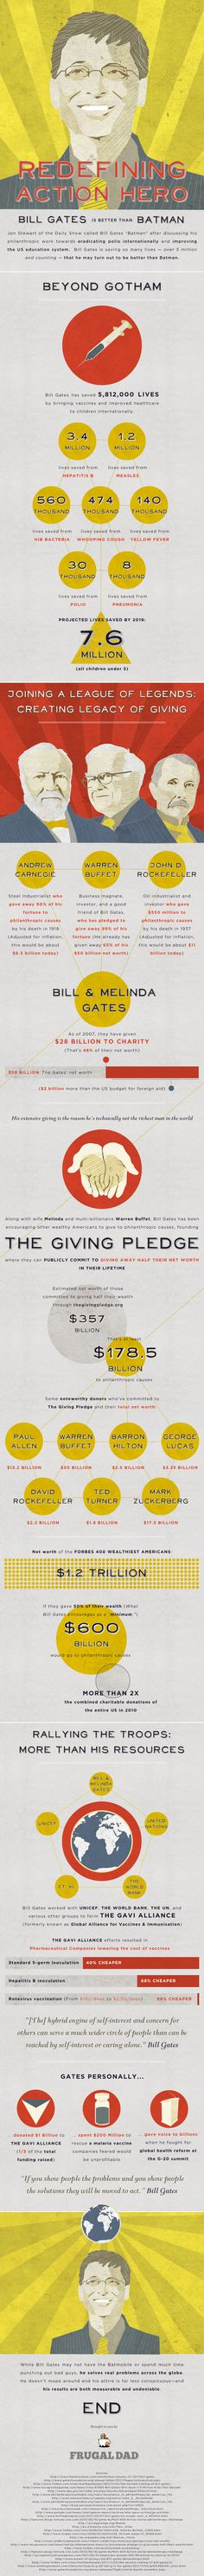 Bill Gates, charity superhero